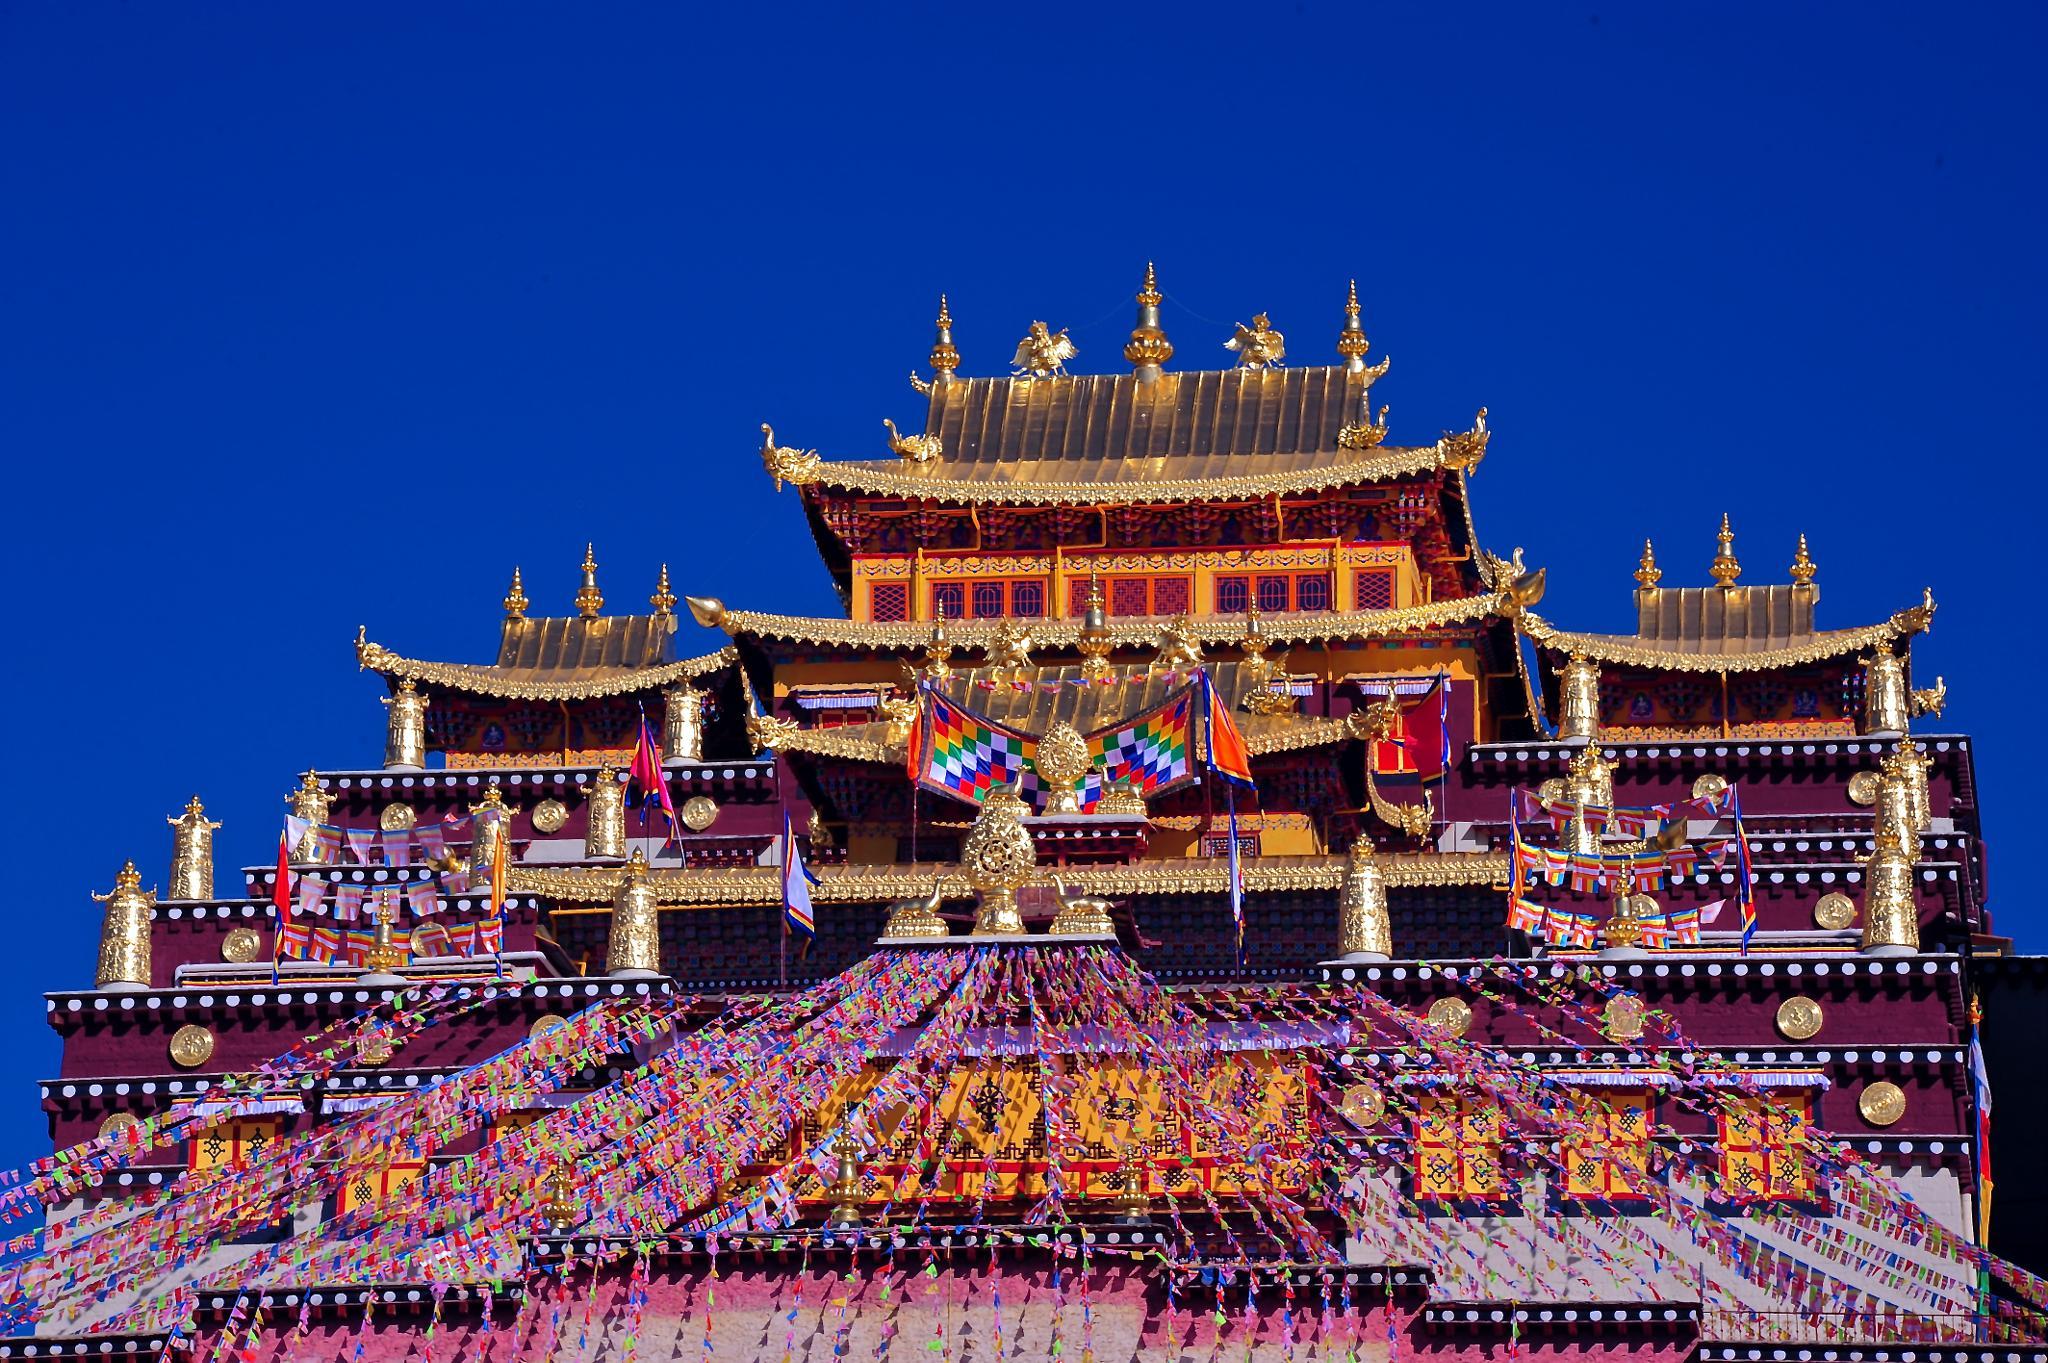 Songzanlin Monastery - Shangri-La, China by Maikeru.C